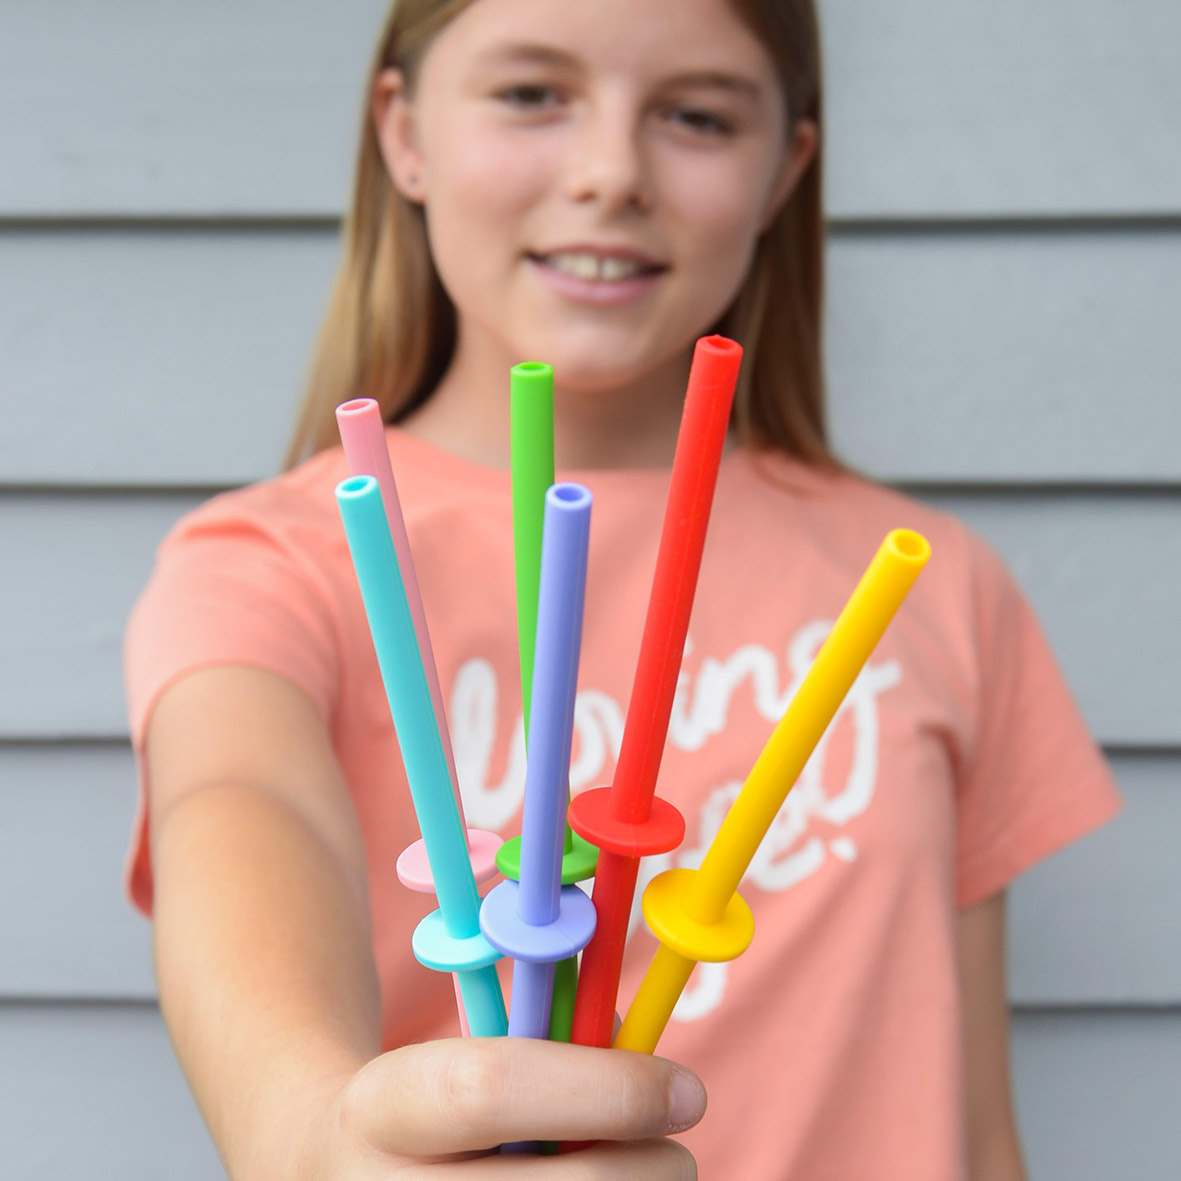 MontiiCo Straws - Silicone Mini Stopper Straw Set - Fruity Pop-2